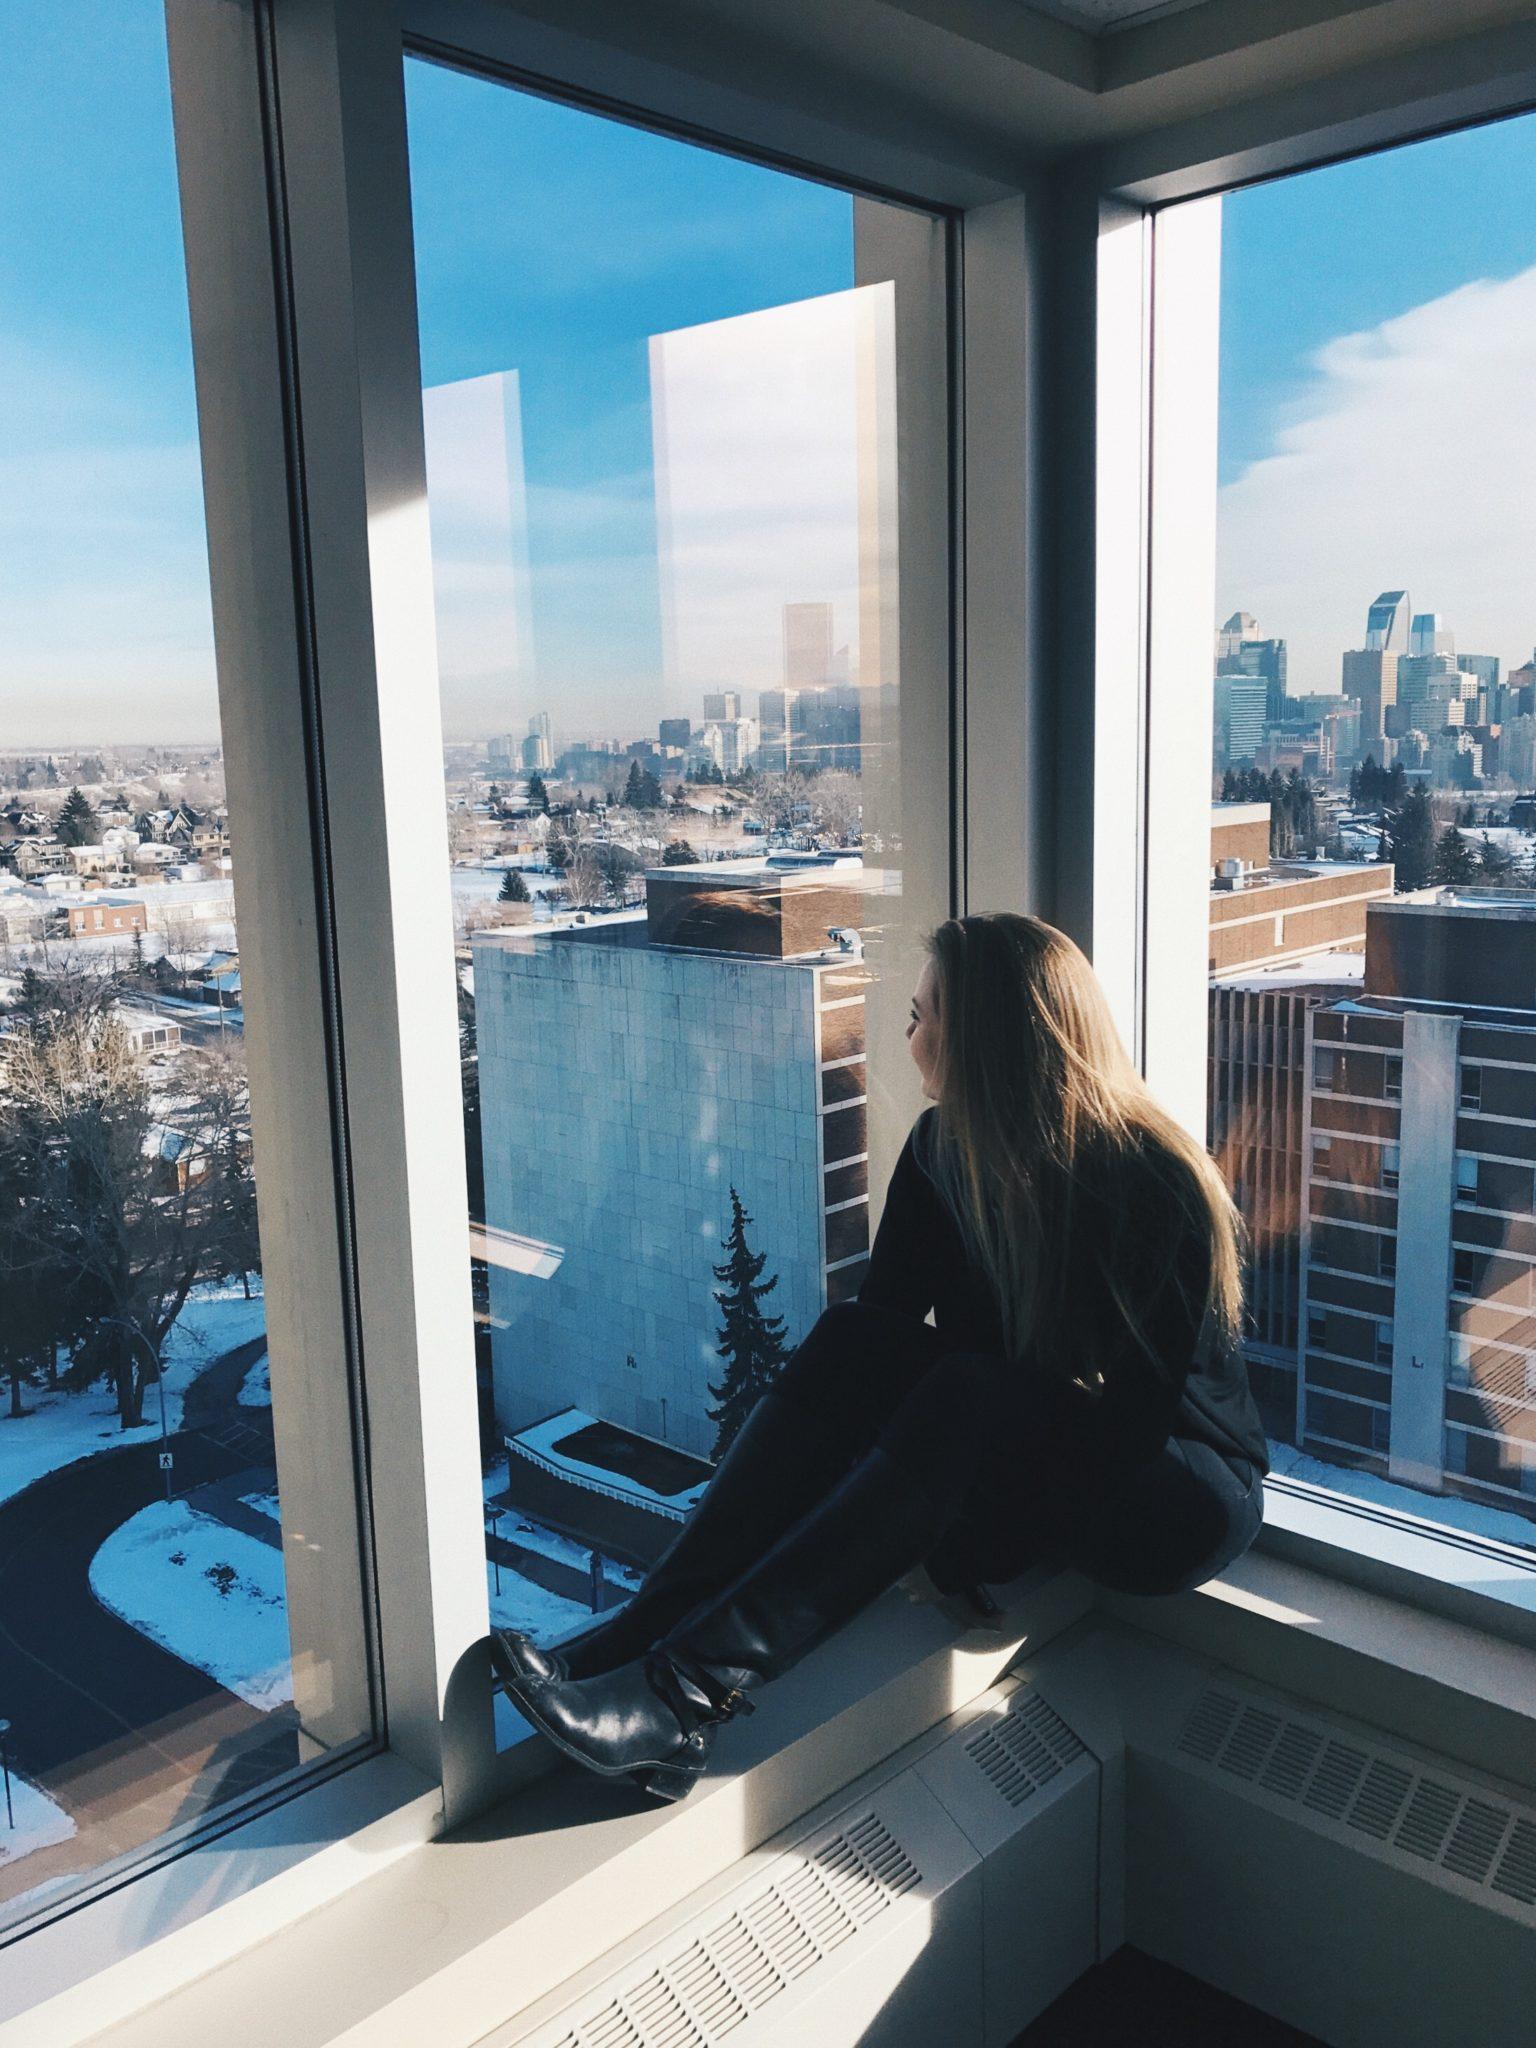 8 Things to Do in Calgary, Alberta